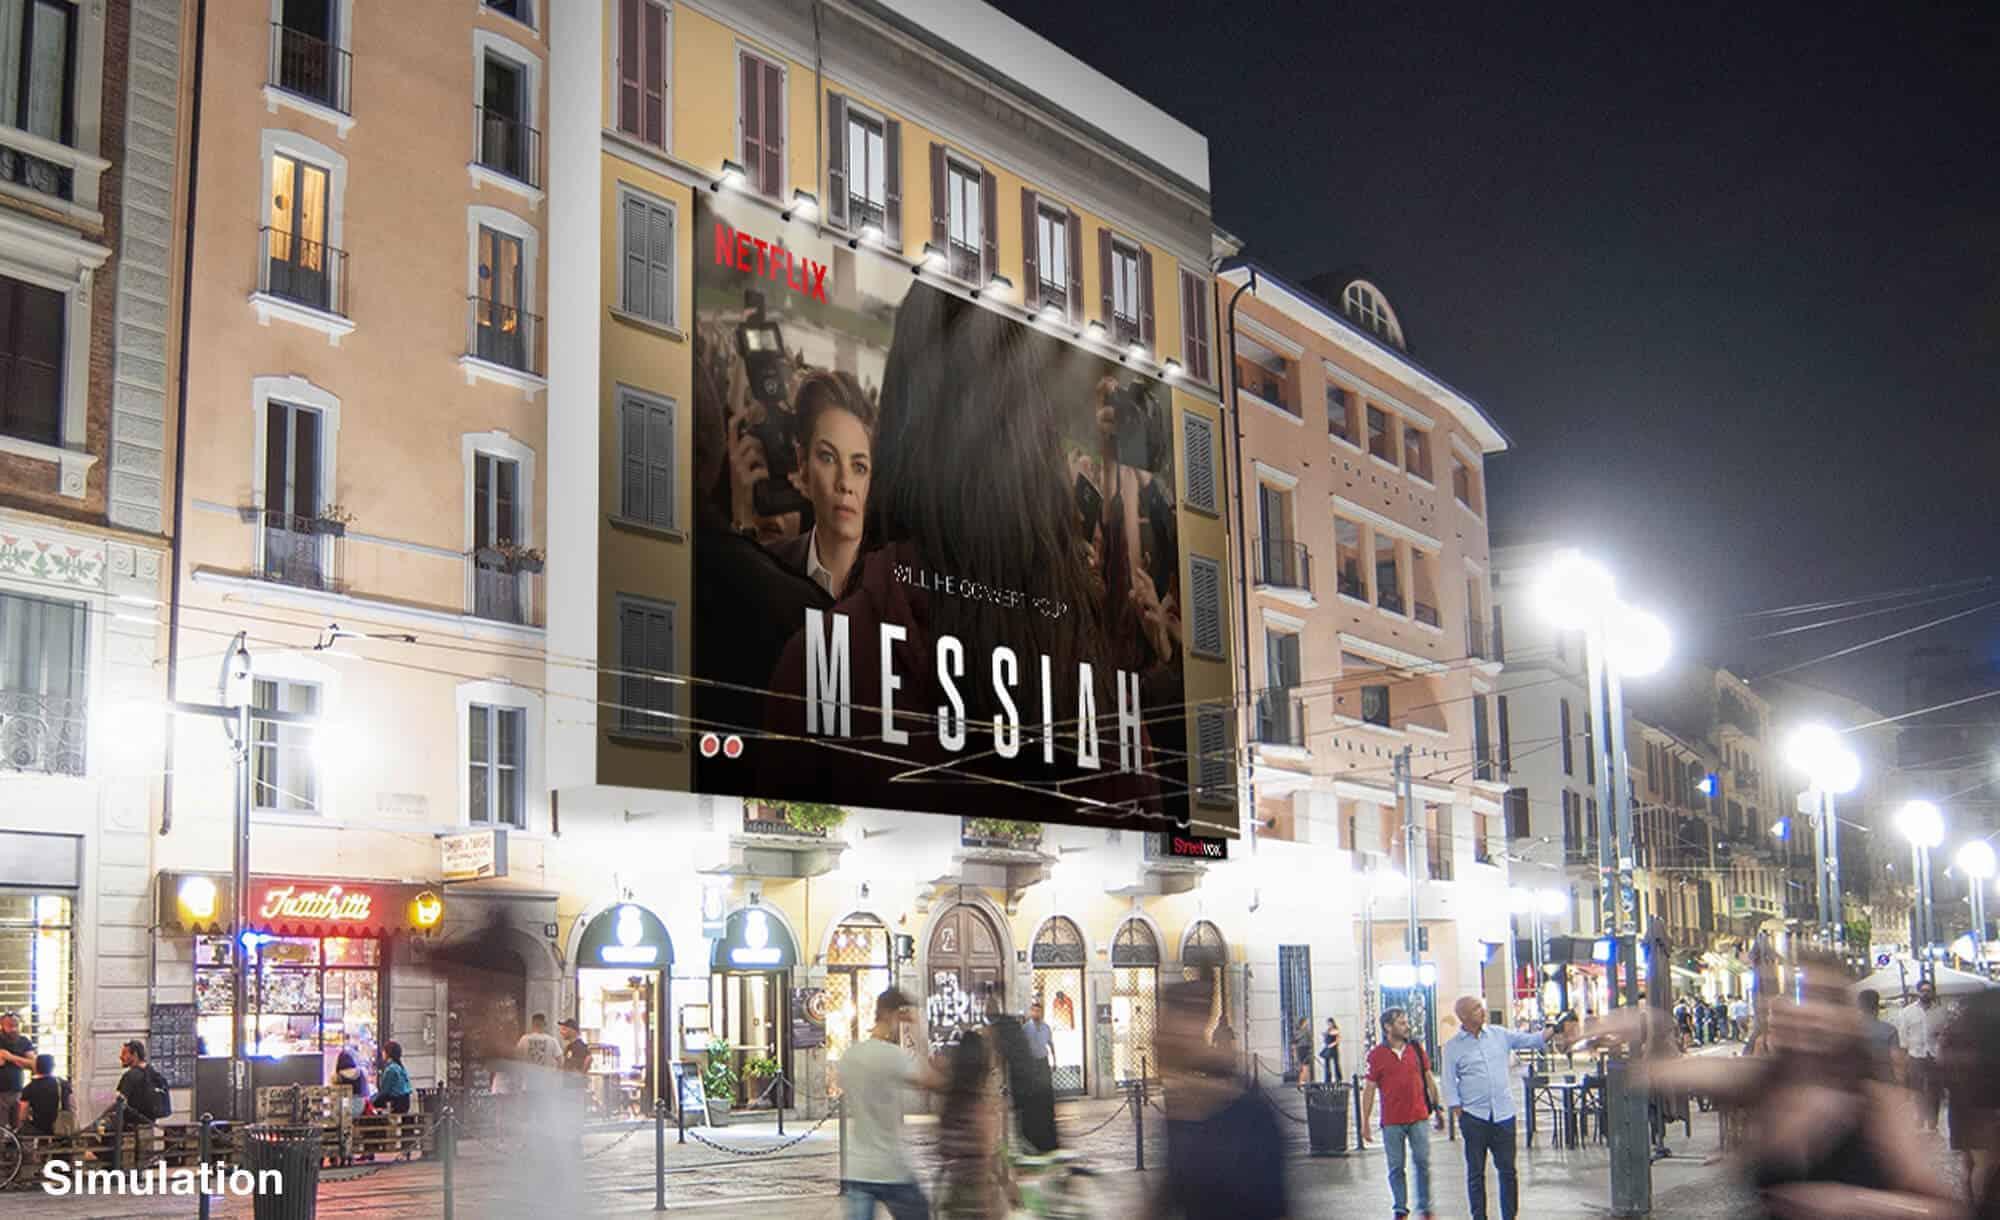 Maxi Affissione a Milano in Corso Ticinese 16 di Huawei (technology)